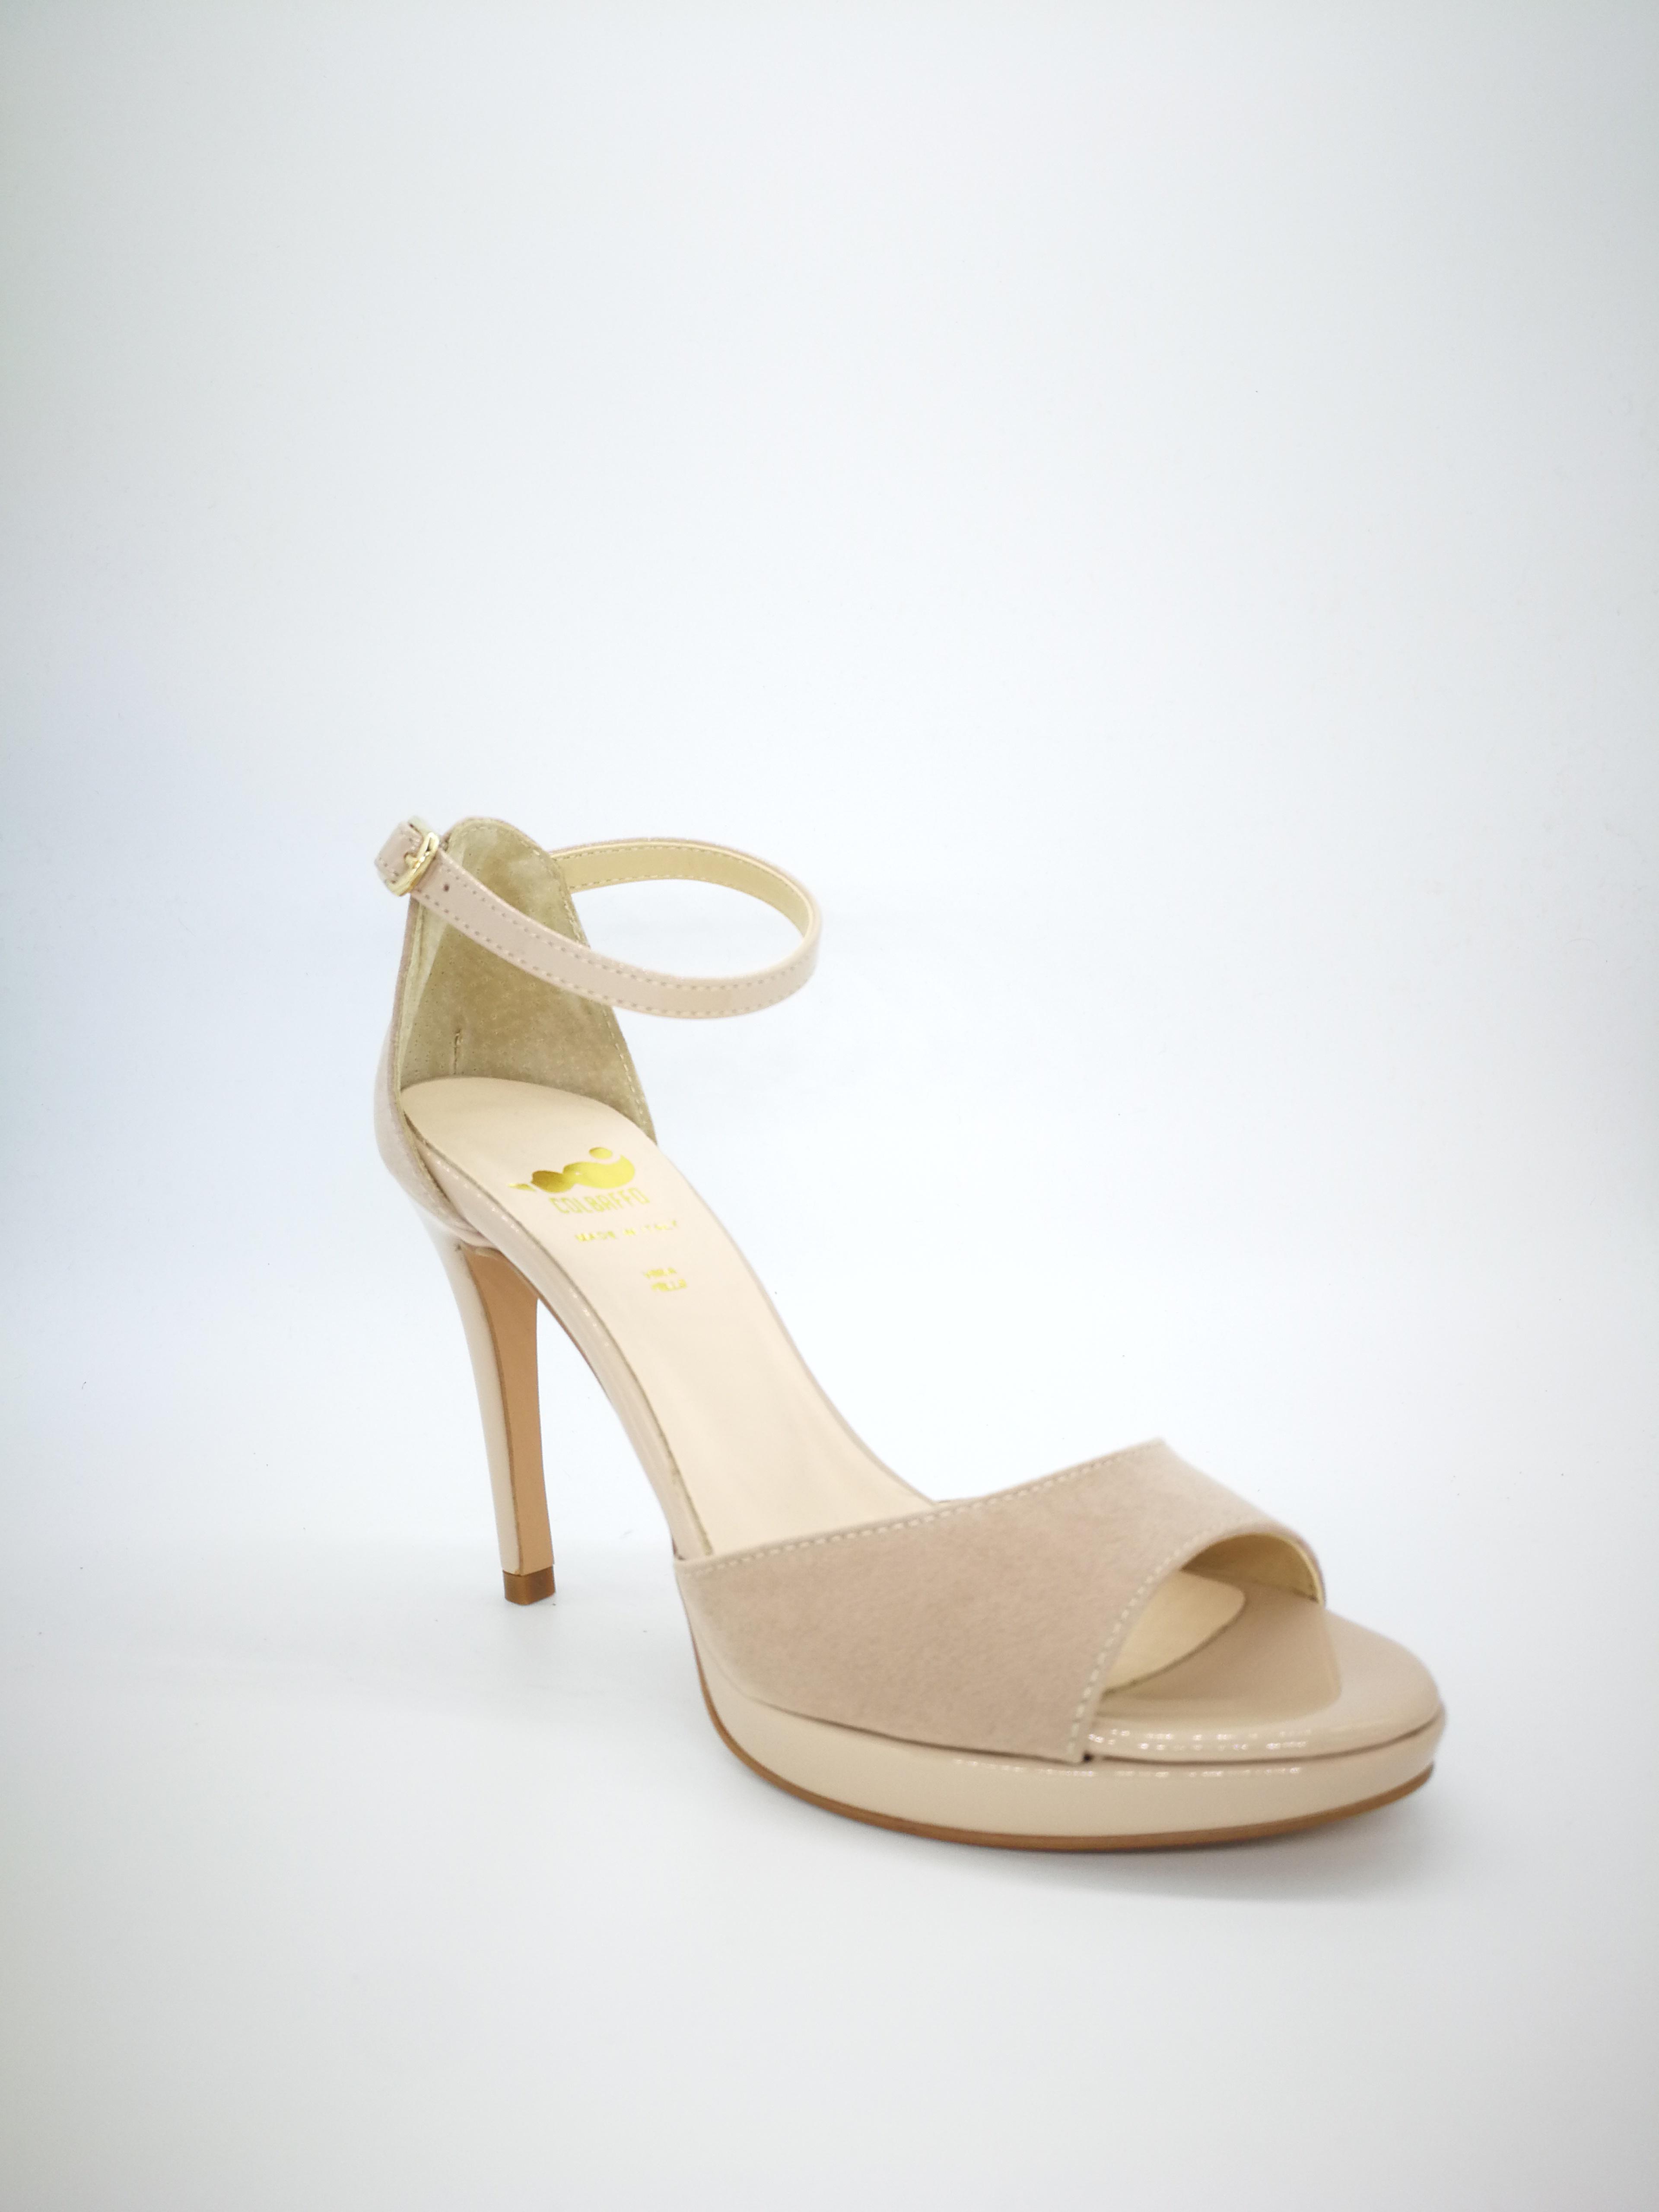 color Powder 1 Colbaffo® Sandalias en Plateau Heel 10 Minimal QChsrdxt